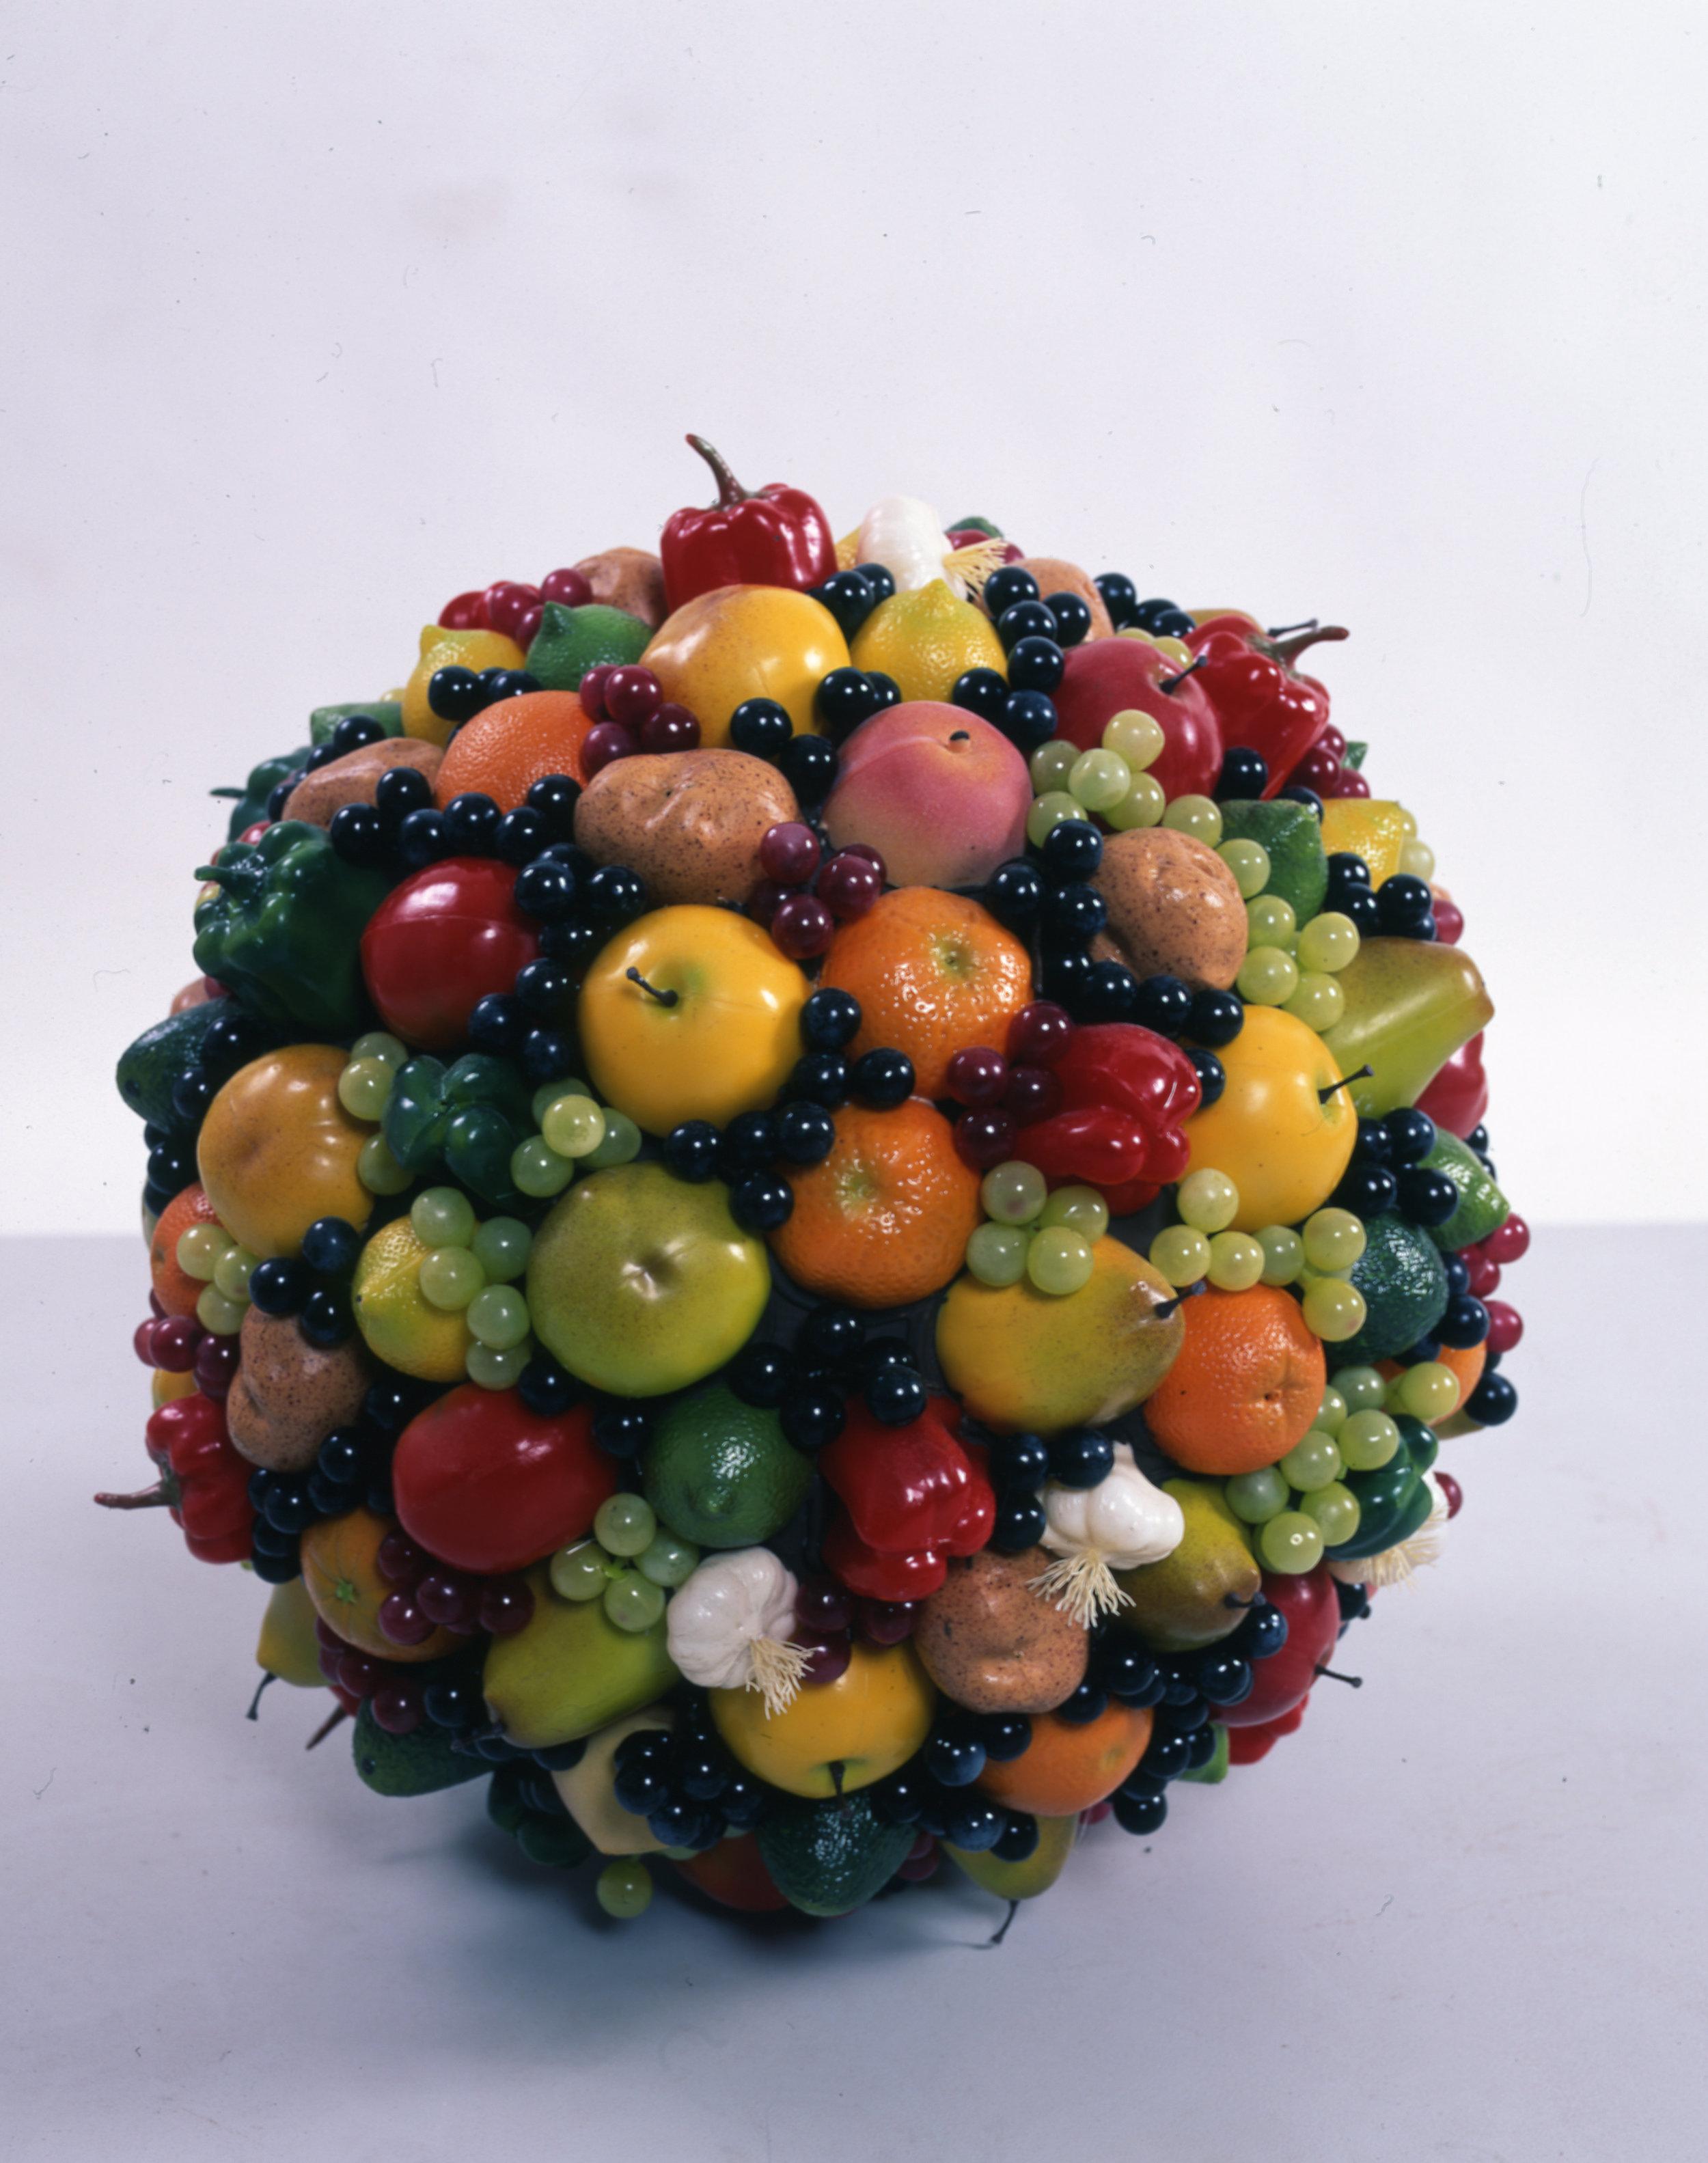 Utopian Ornament, 2003 styrofoam sphere with plastic fruits diam.: 61 cm - 24 inches